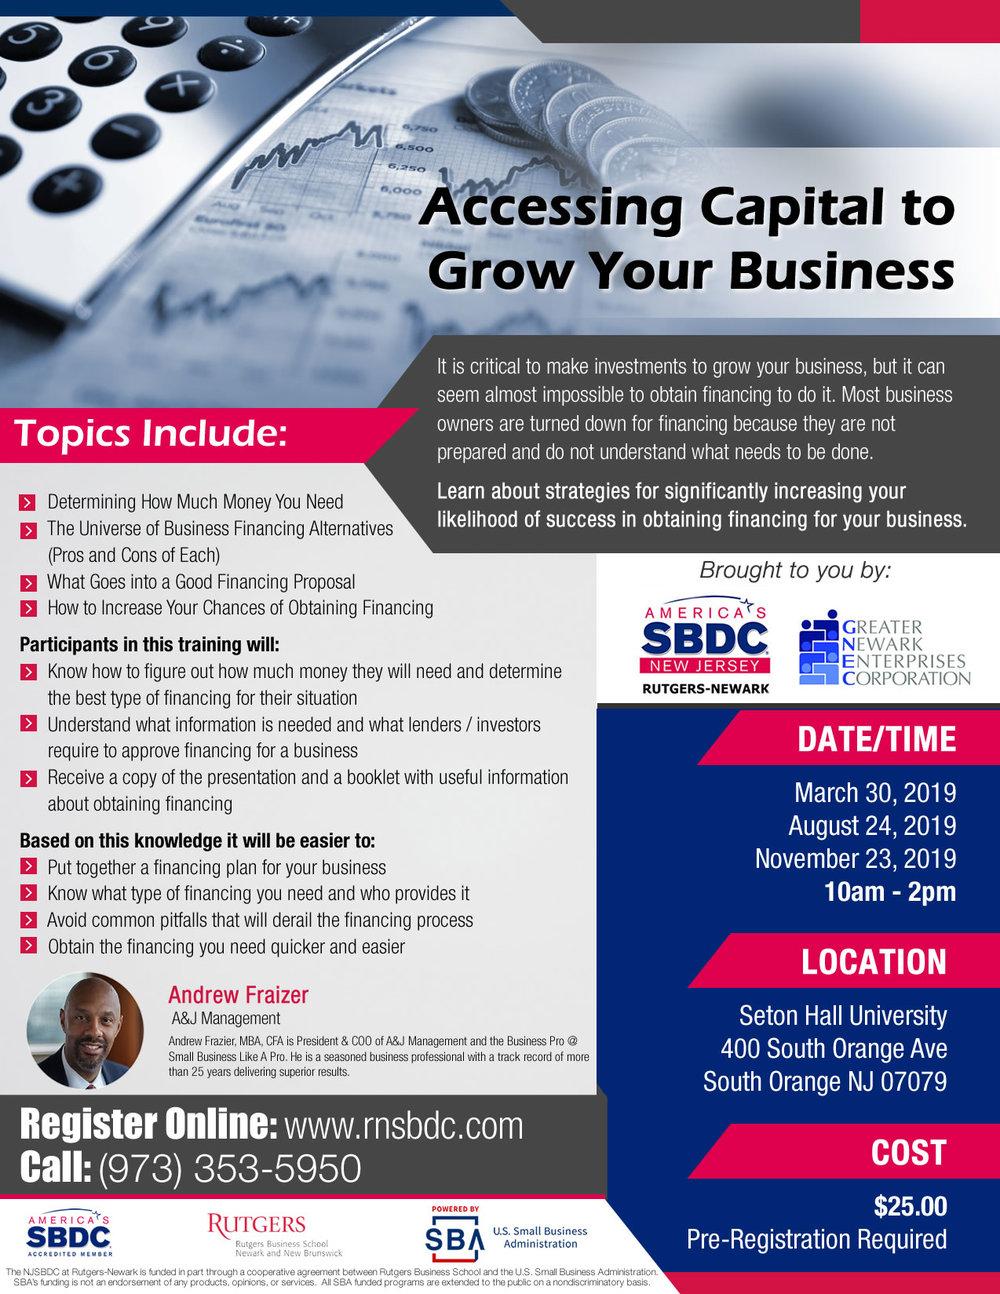 Accessing Capital Flyer 2019.jpg